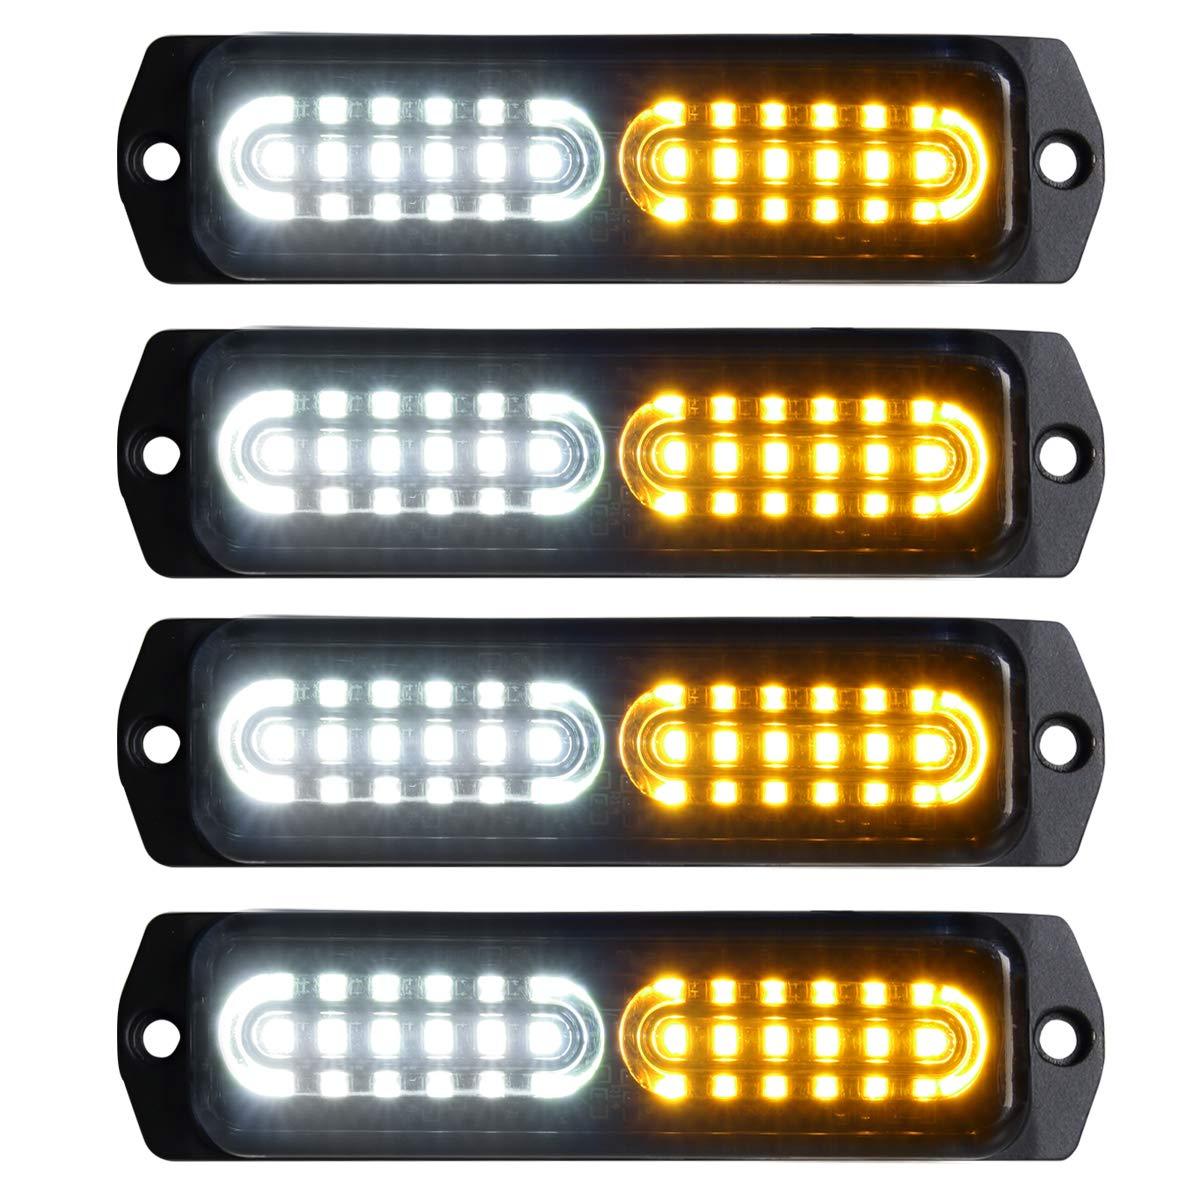 Amber//White 4pcs Ultra Slim 12-LED Surface Mount Grille Flashing Strobe Lights for Truck Car Vehicle Mini LED Light-Head Emergency Beacon Hazard Warning lights 12-24V